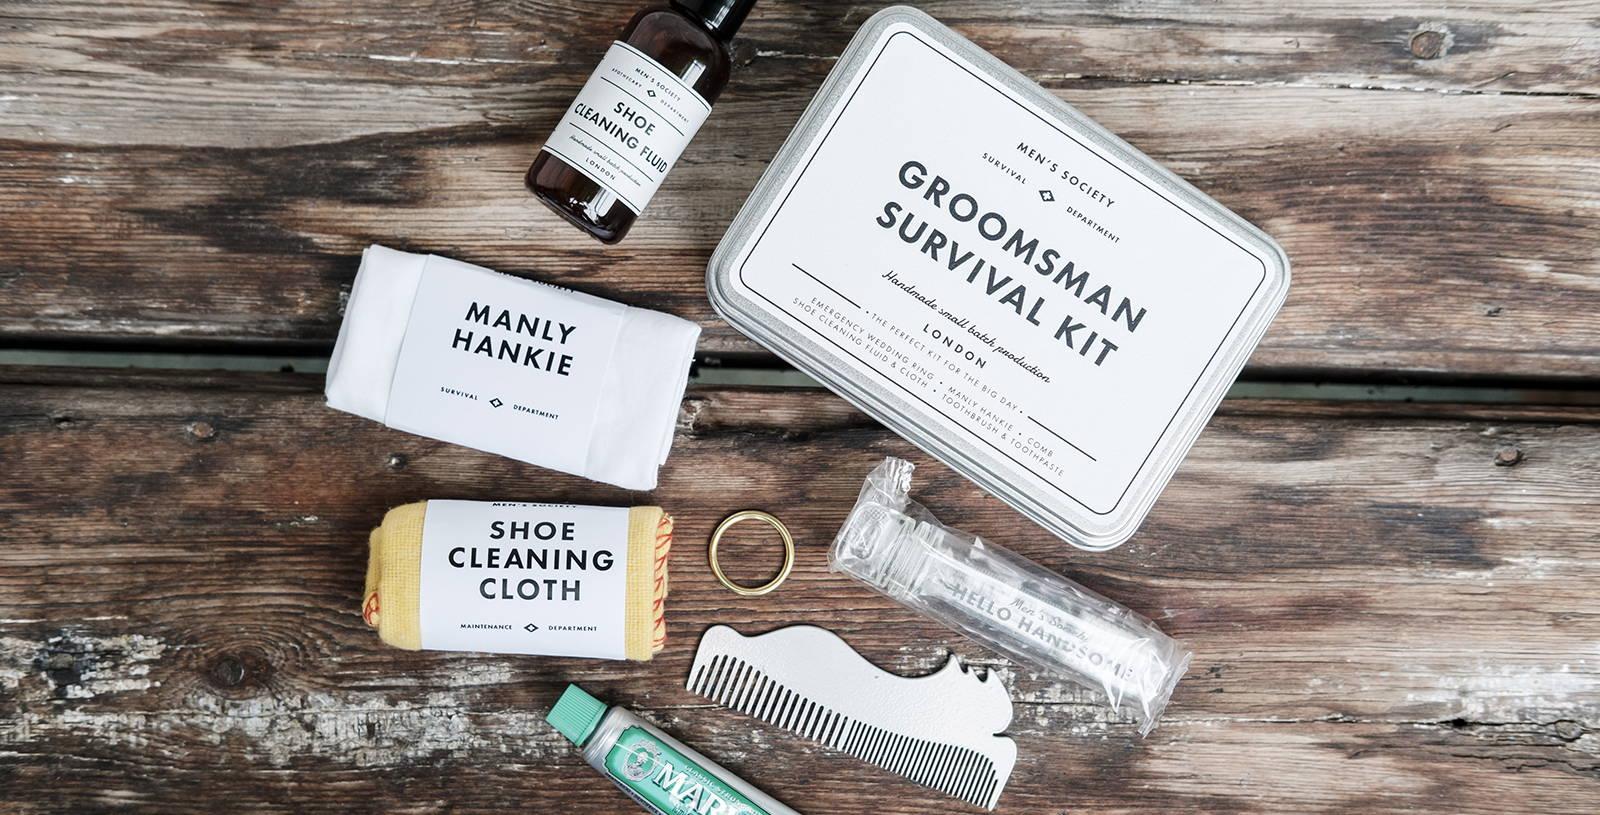 Groomsman Survival Kit